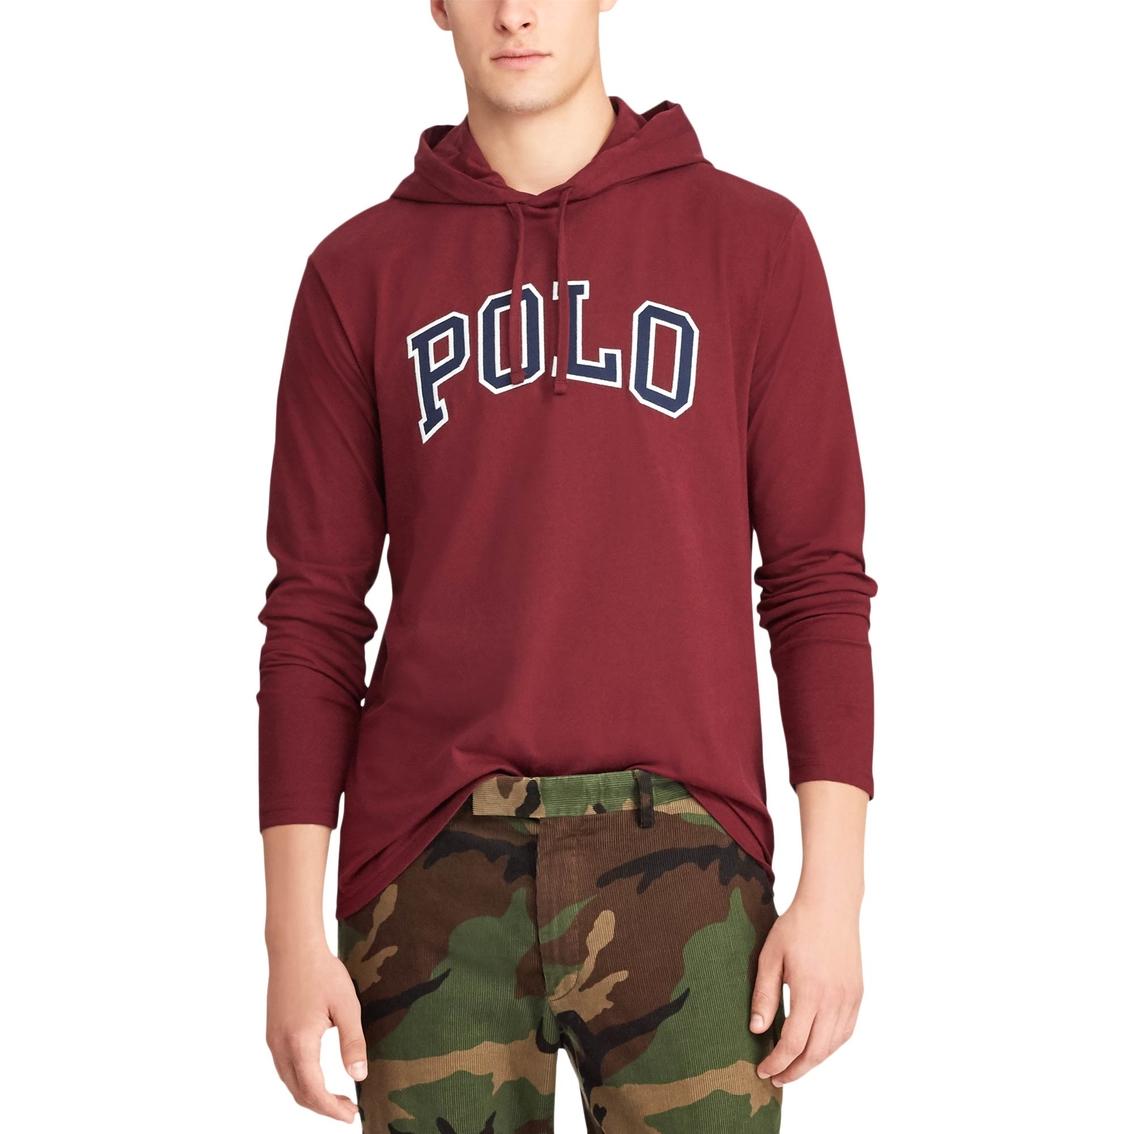 404c78868a5 Polo Ralph Lauren Cotton Jersey Hooded Tee | T-shirts | Apparel ...